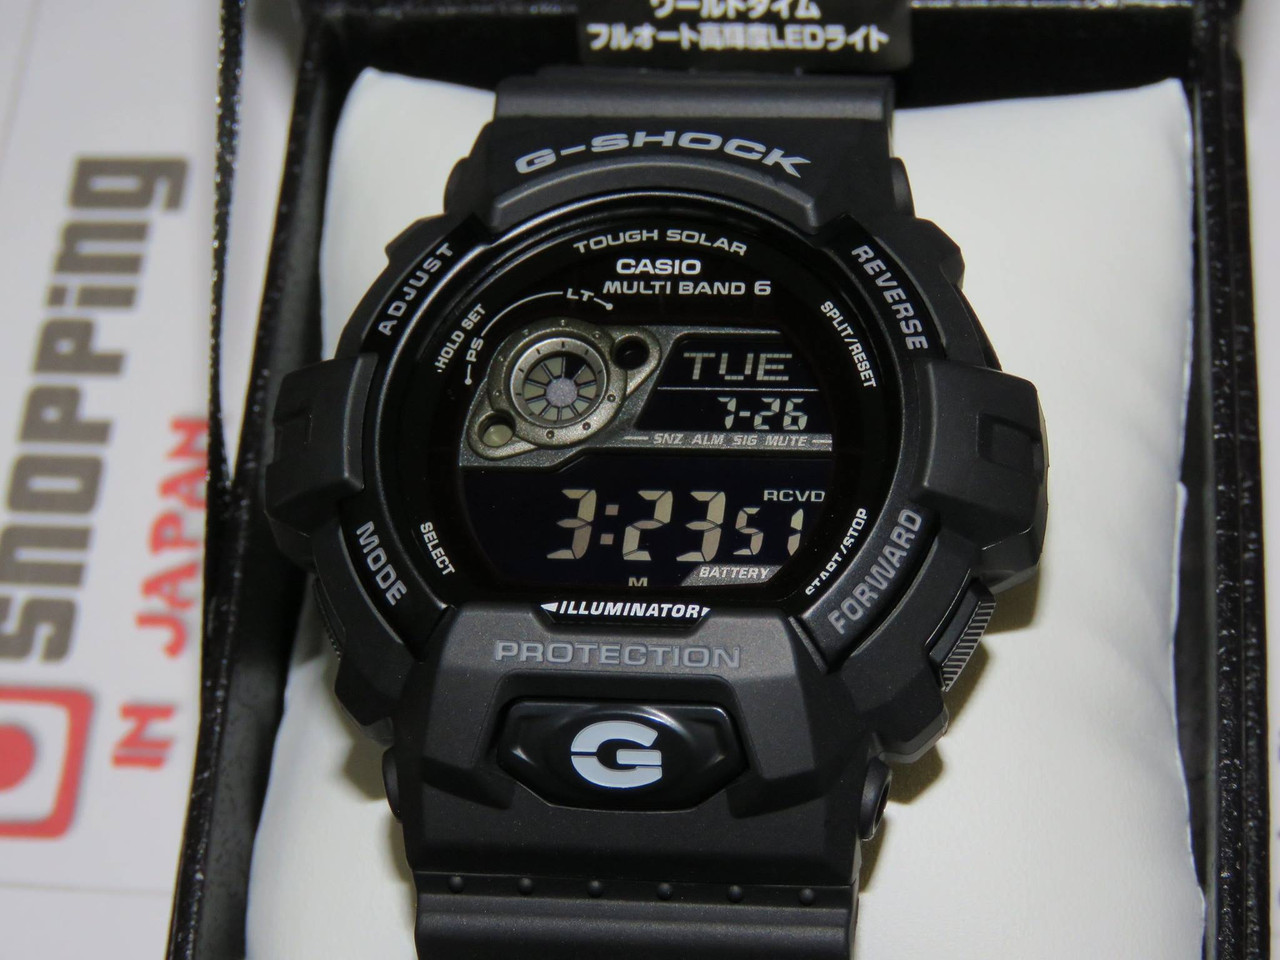 GW-8900A-1JF